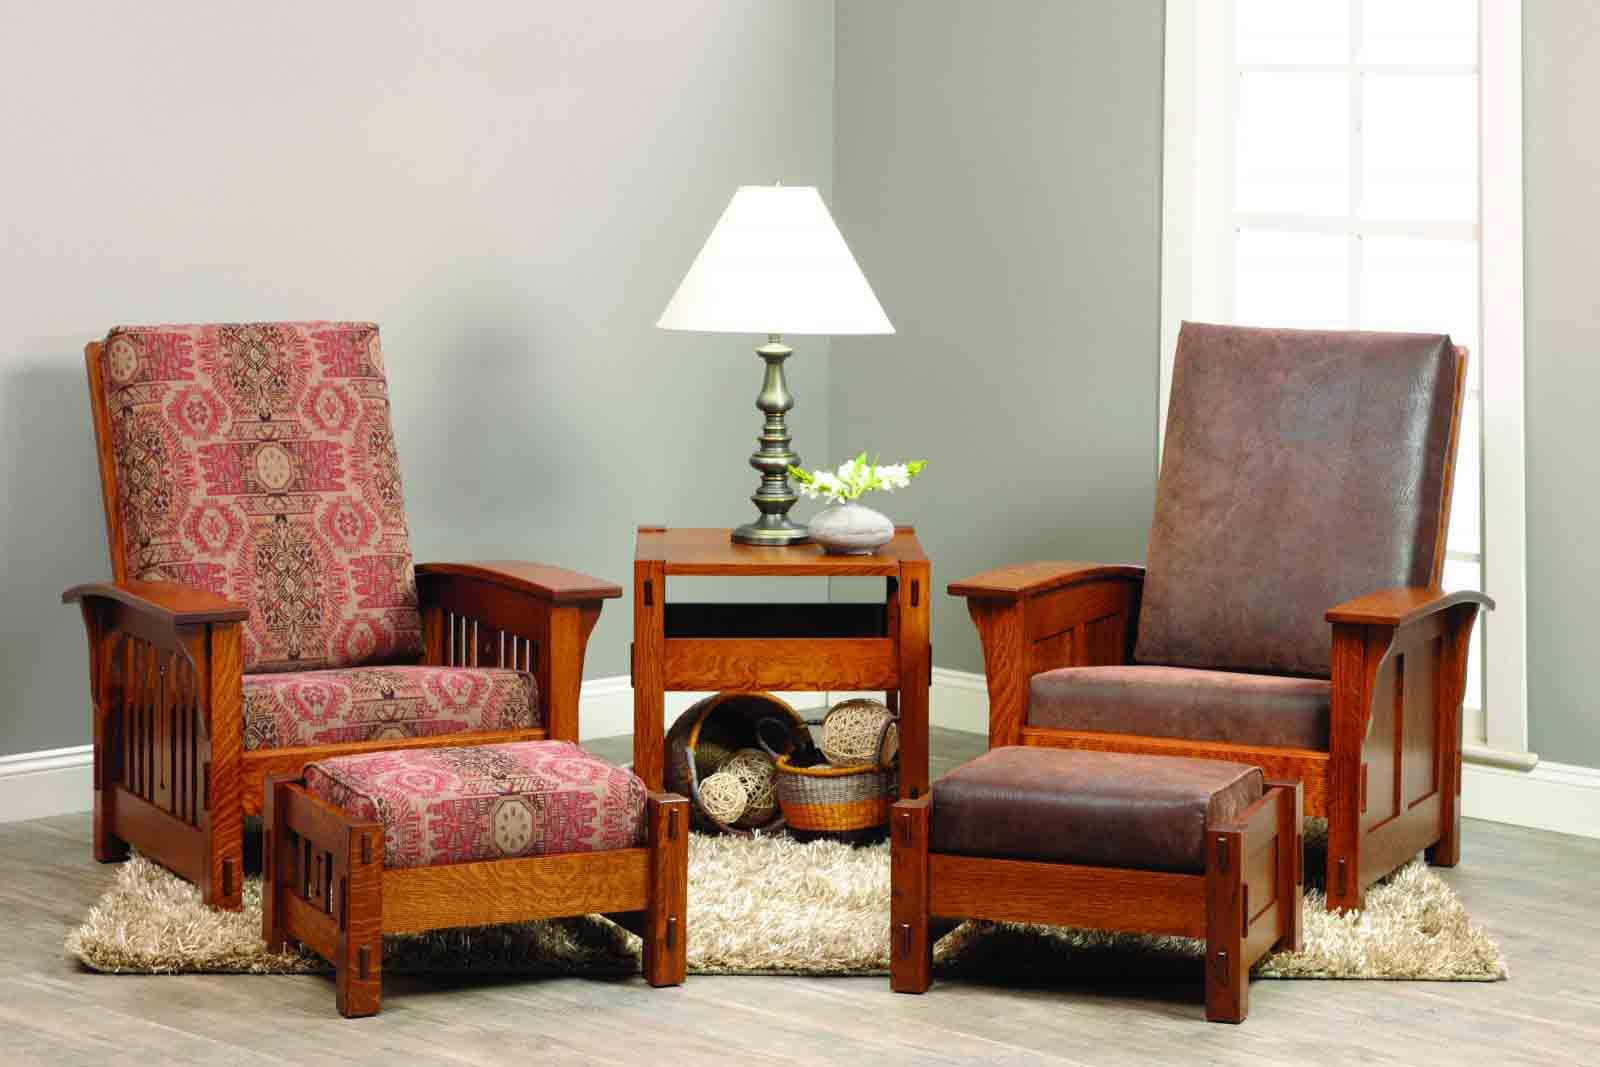 Morris Chairs